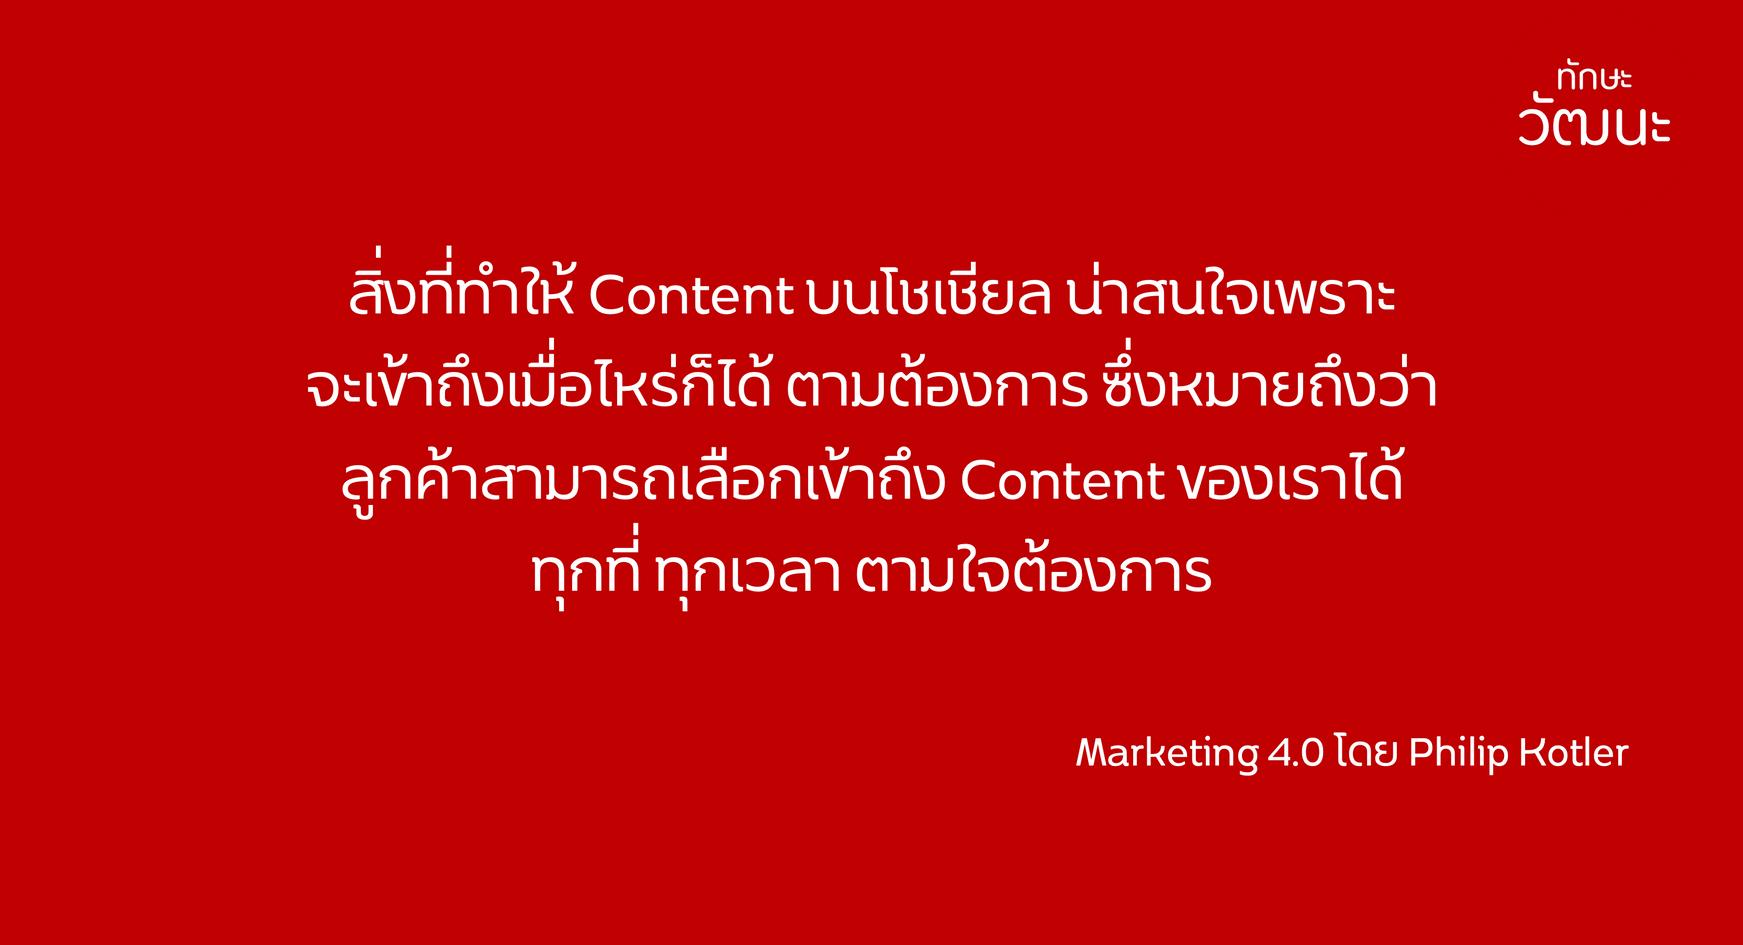 Marketing 4.0 Quote#3